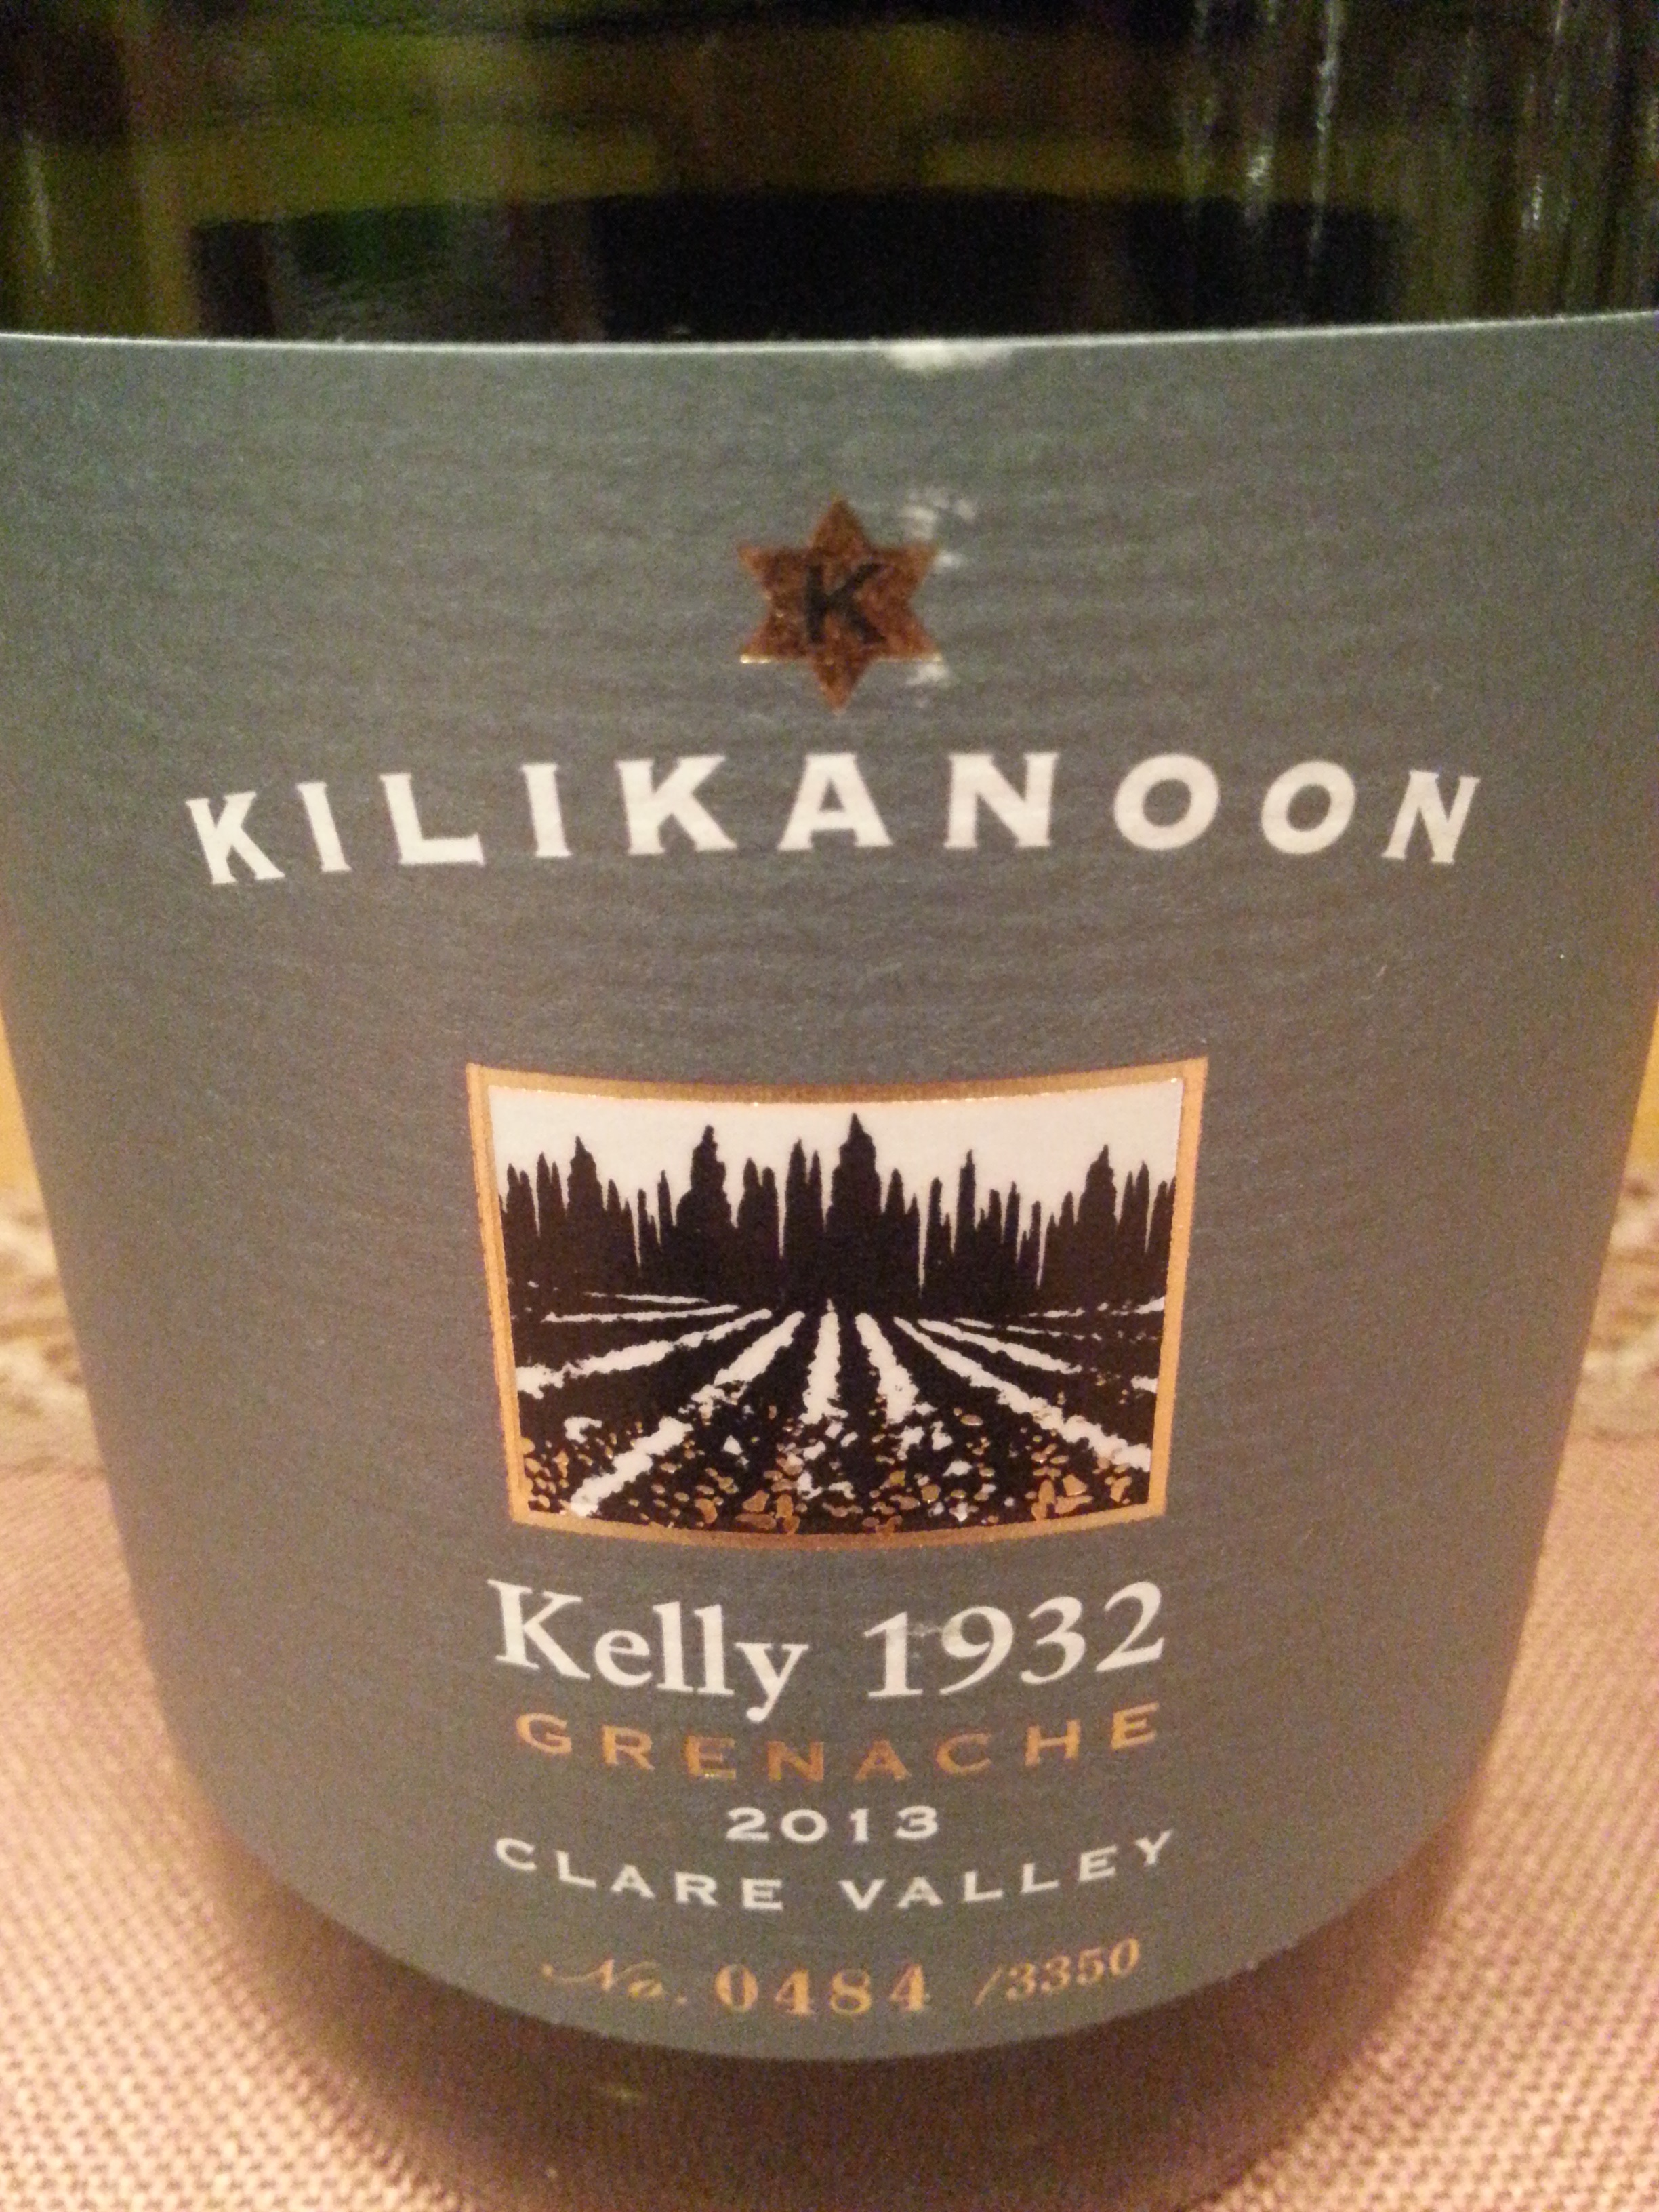 2013 Grenache Kelly 1932 | Kilikanoon